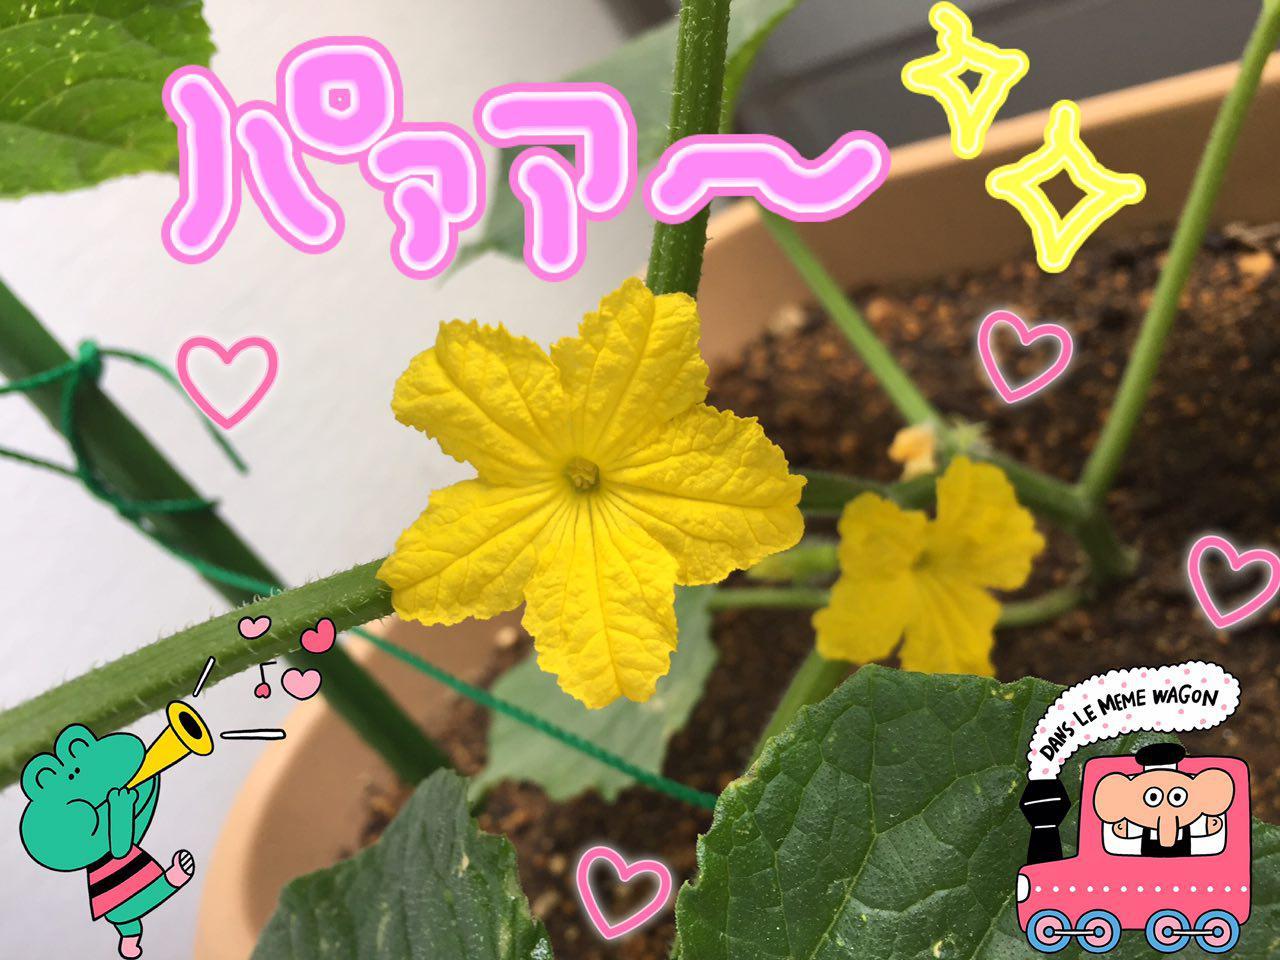 photo_2017-06-05_00-29-34.jpg